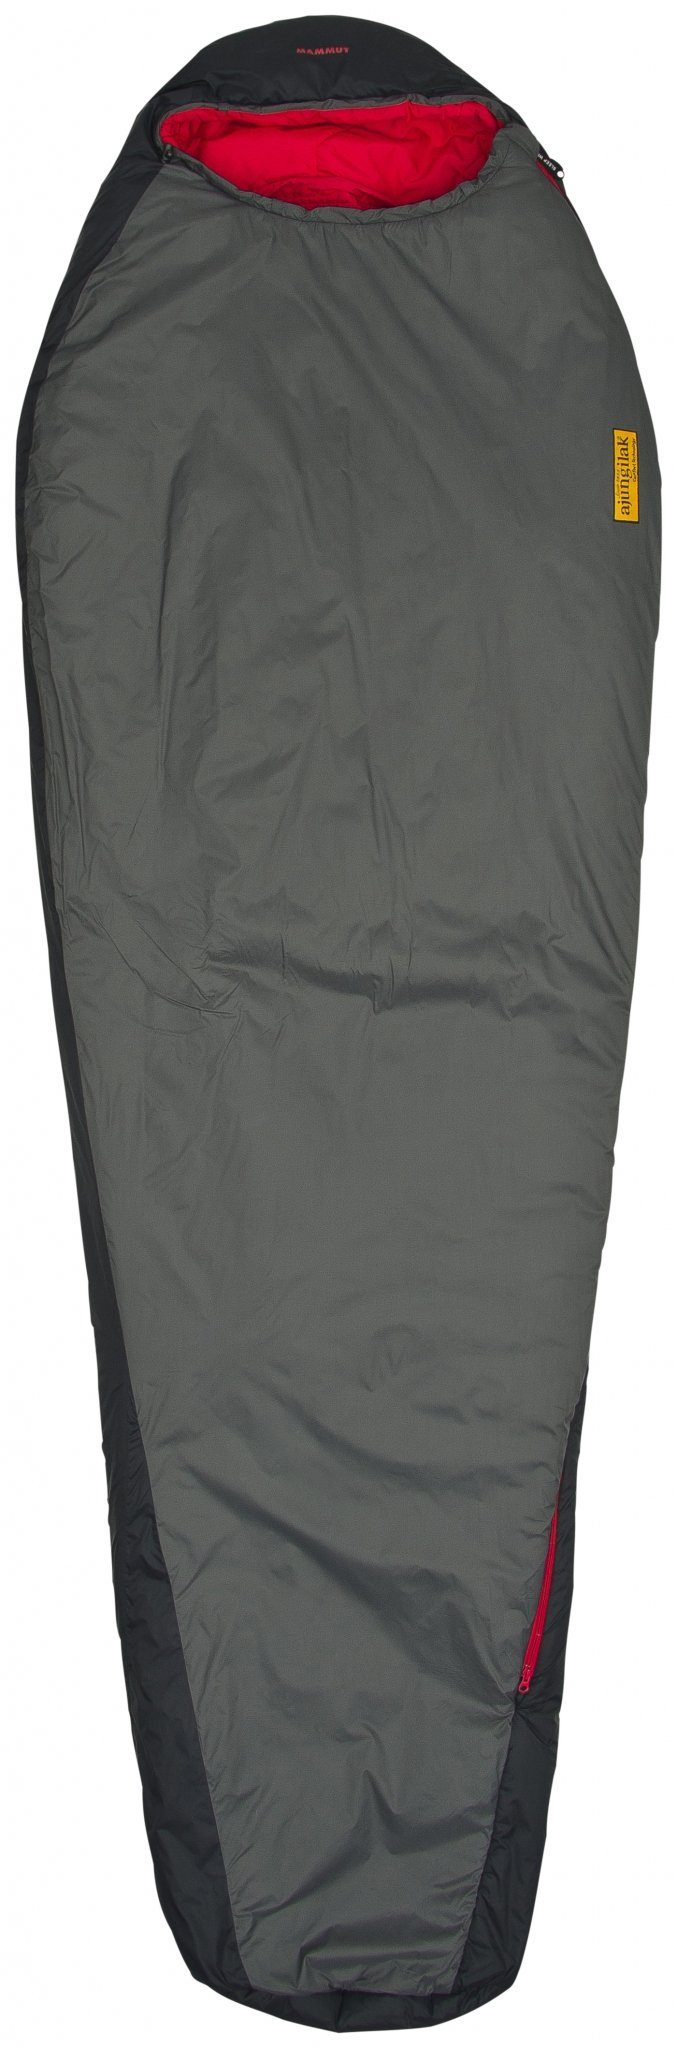 Mammut Schlafsack »Kompakt 3-Season 195 Sleeping Bag«